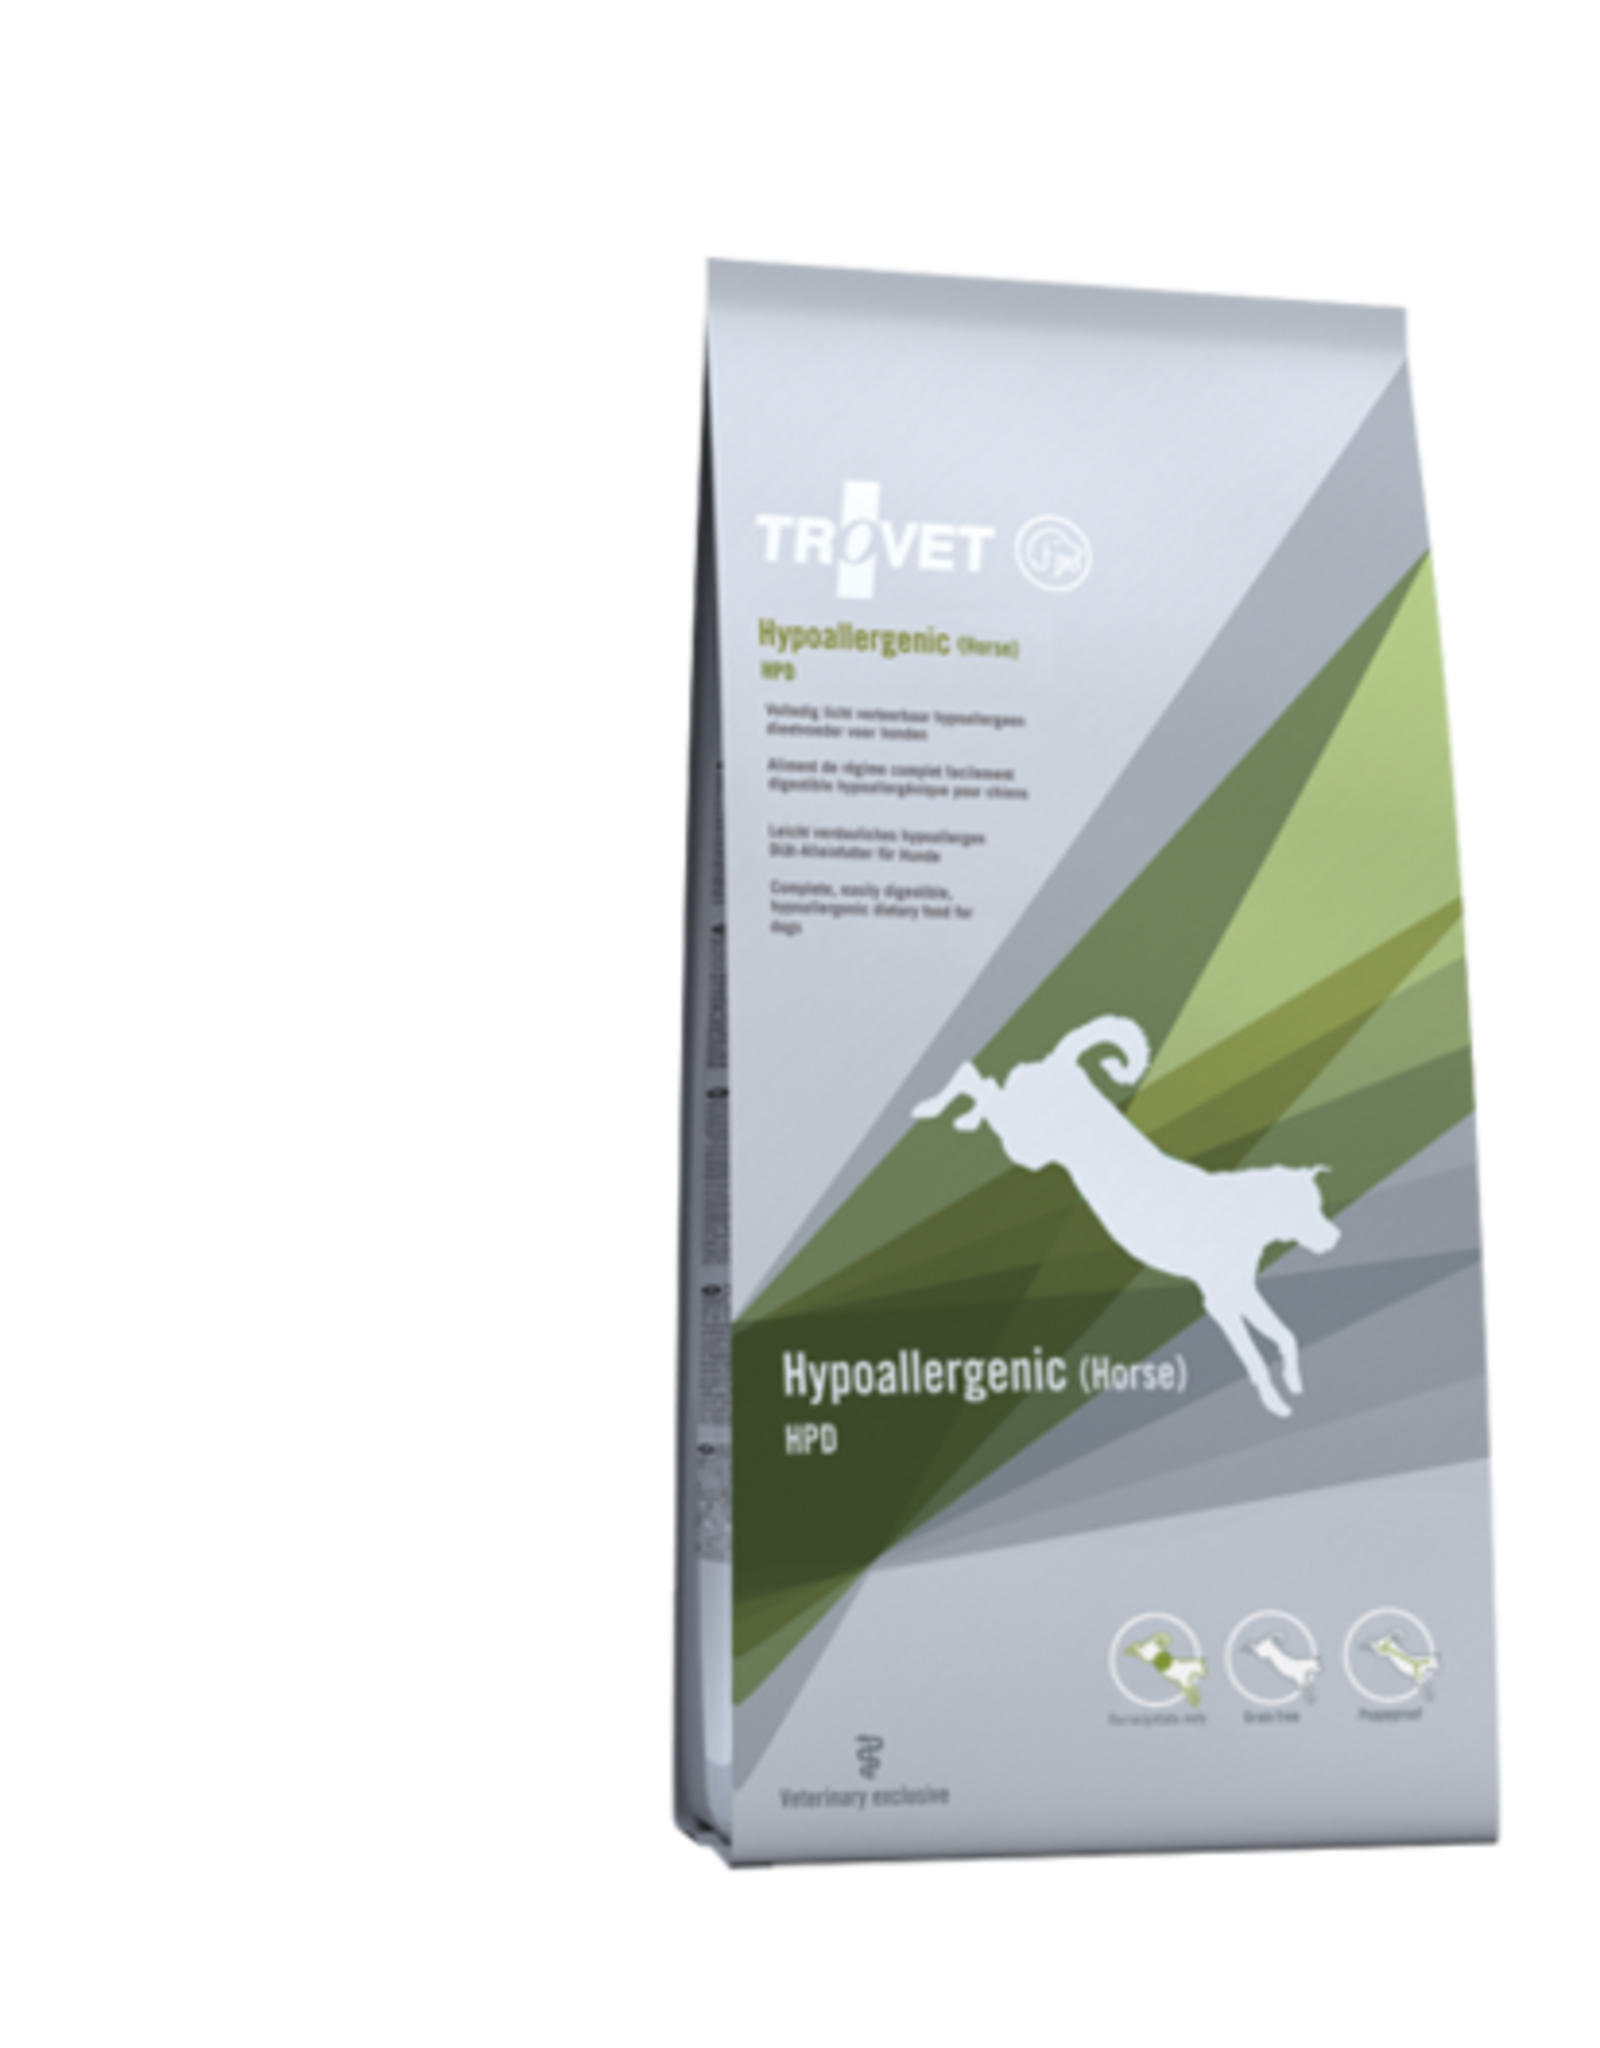 Trovet Trovet Hpd Hypoallergenic Dog Horse 3kg